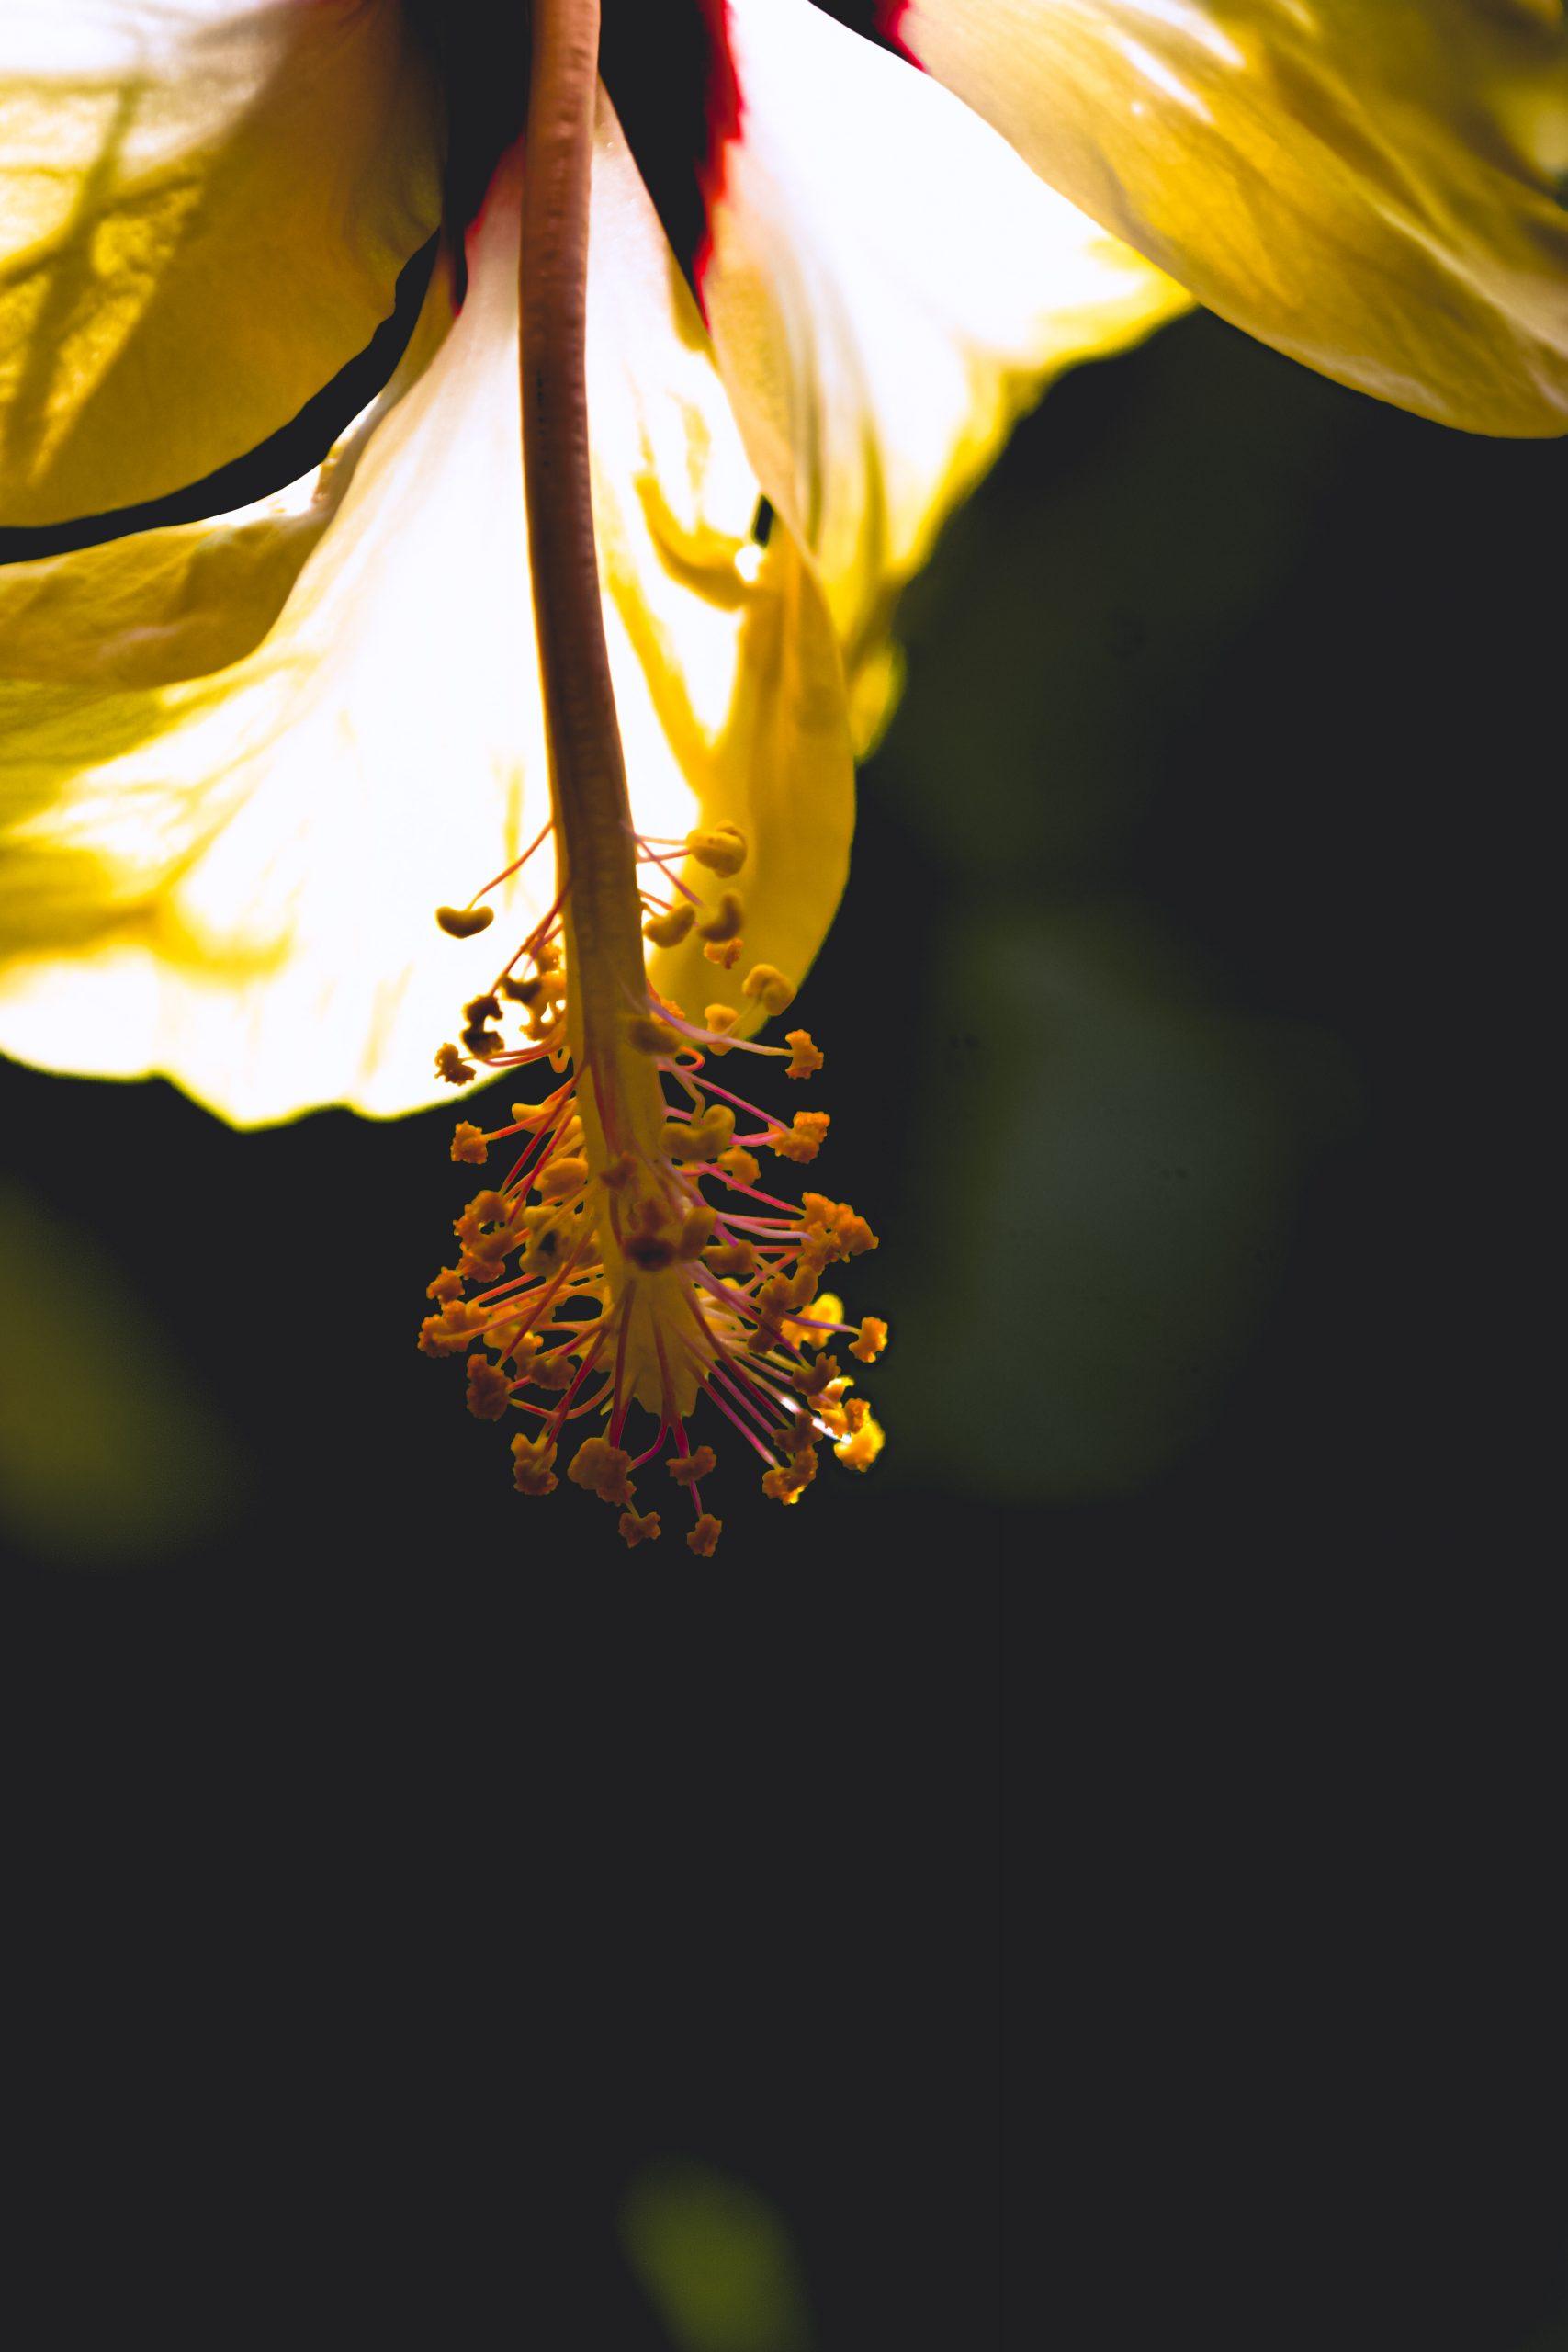 Let the sun shine hit the flower.